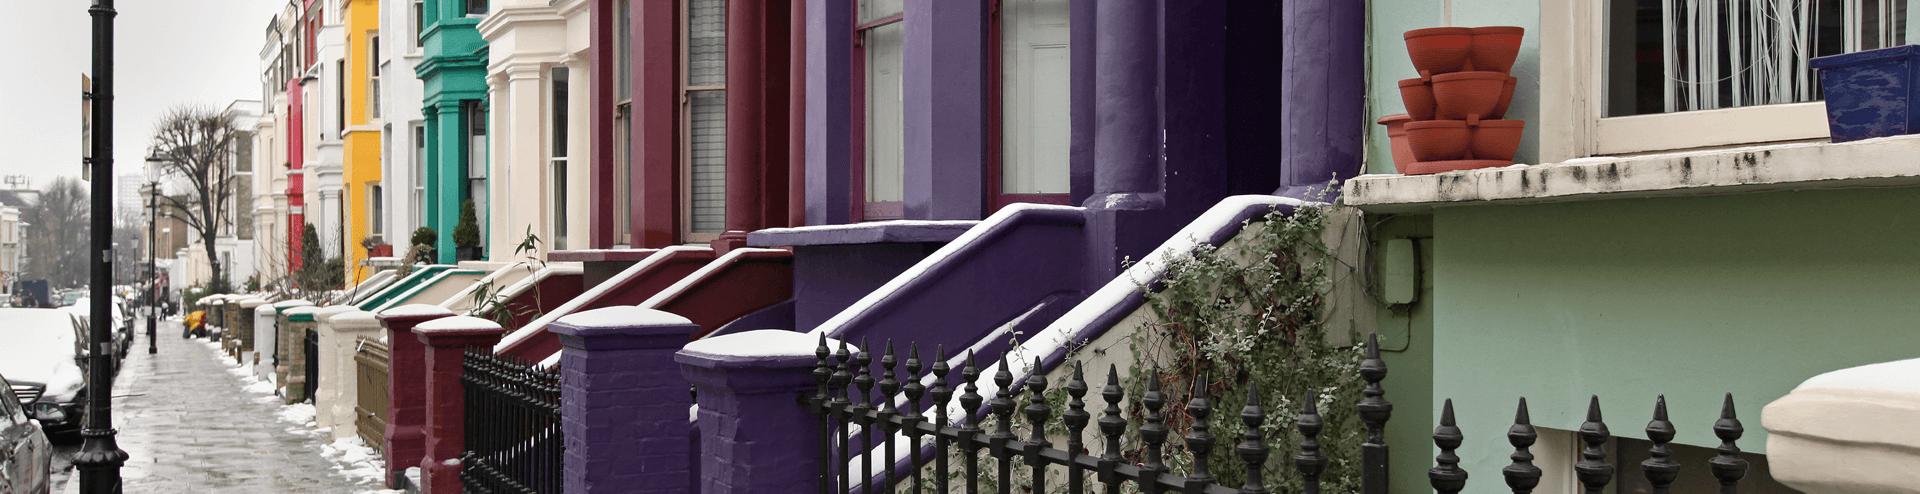 Row of coloured houses